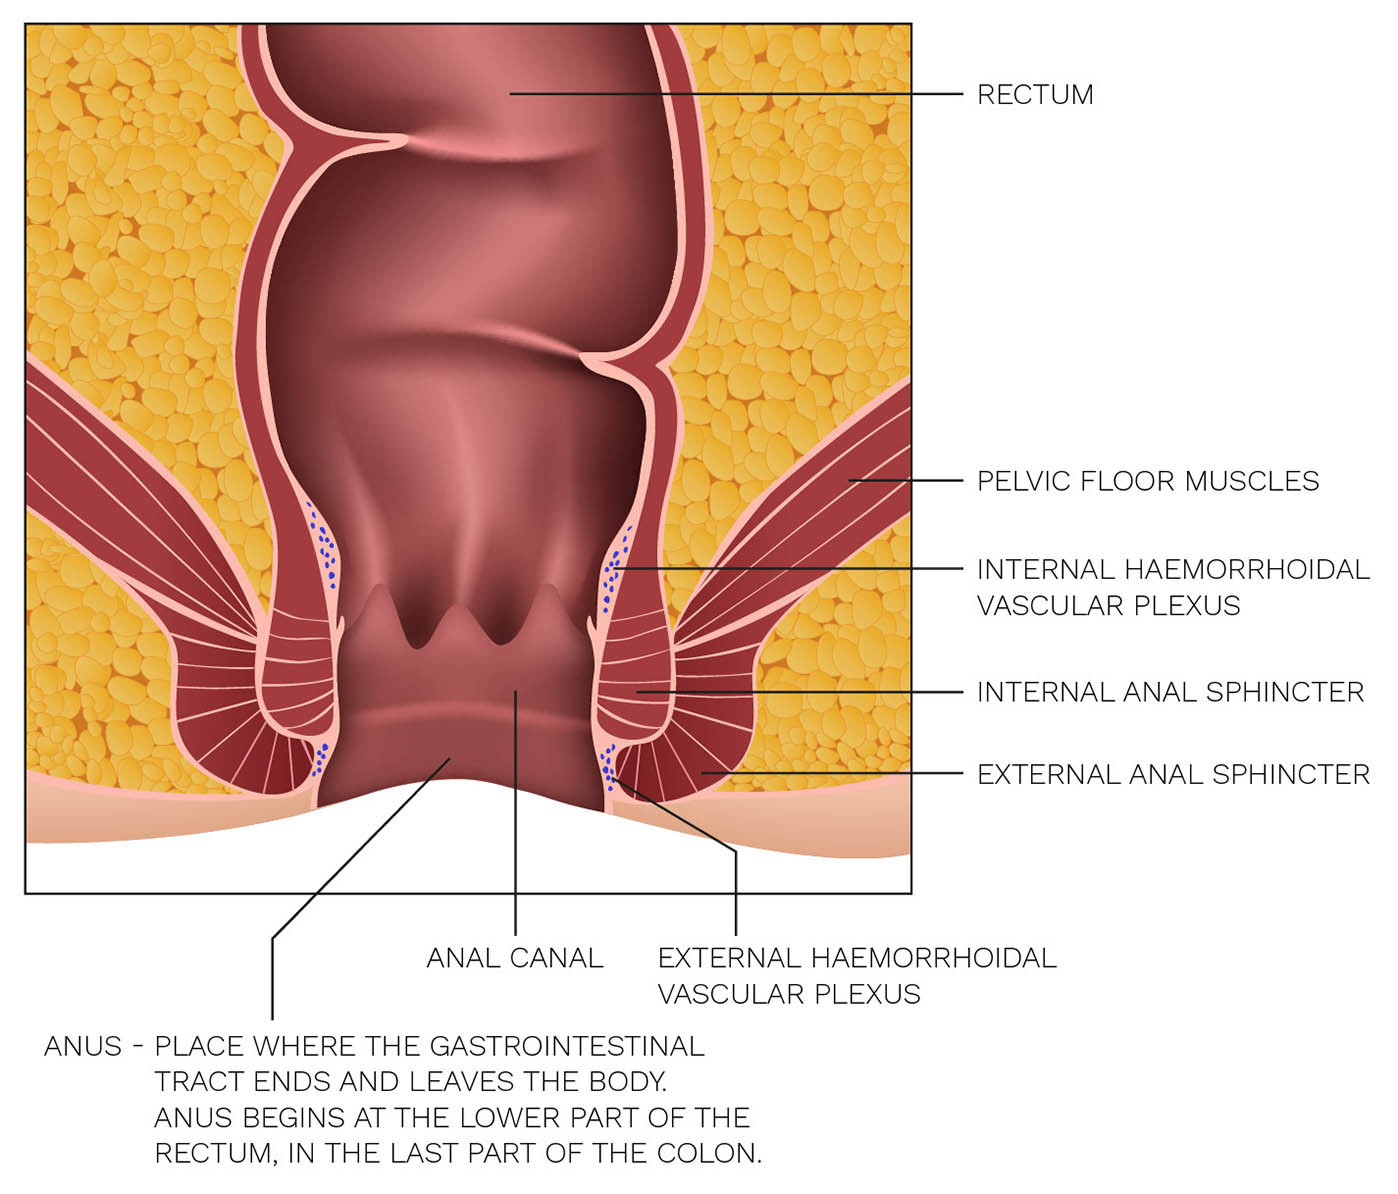 Haemorrhoids as a disease | Rectovenal